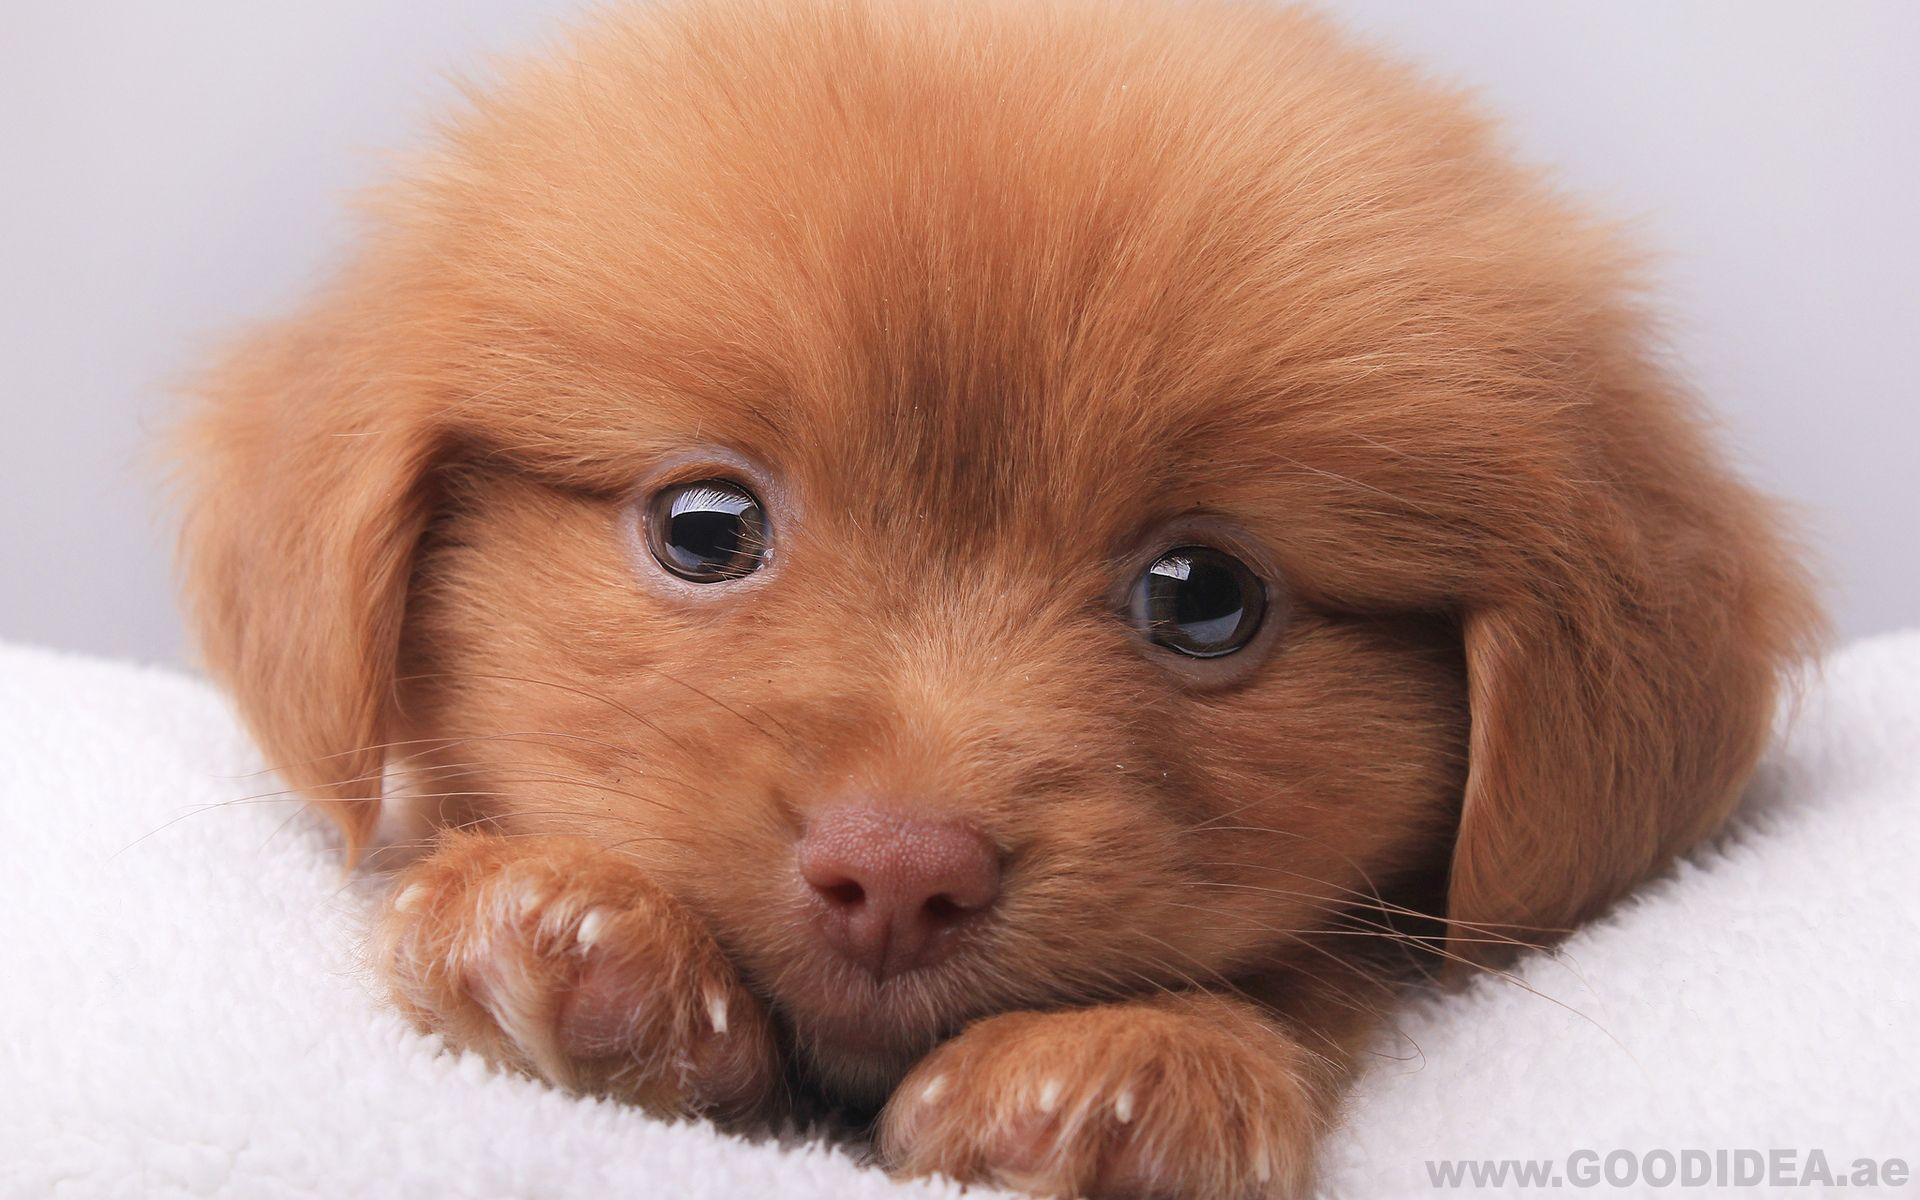 Hounds Follow Those Who Feed Them Good Idea Pet Shop Dog Pet Mansbestfriend Love Puppy Boy Bab Cute Animals Puppy Eyes